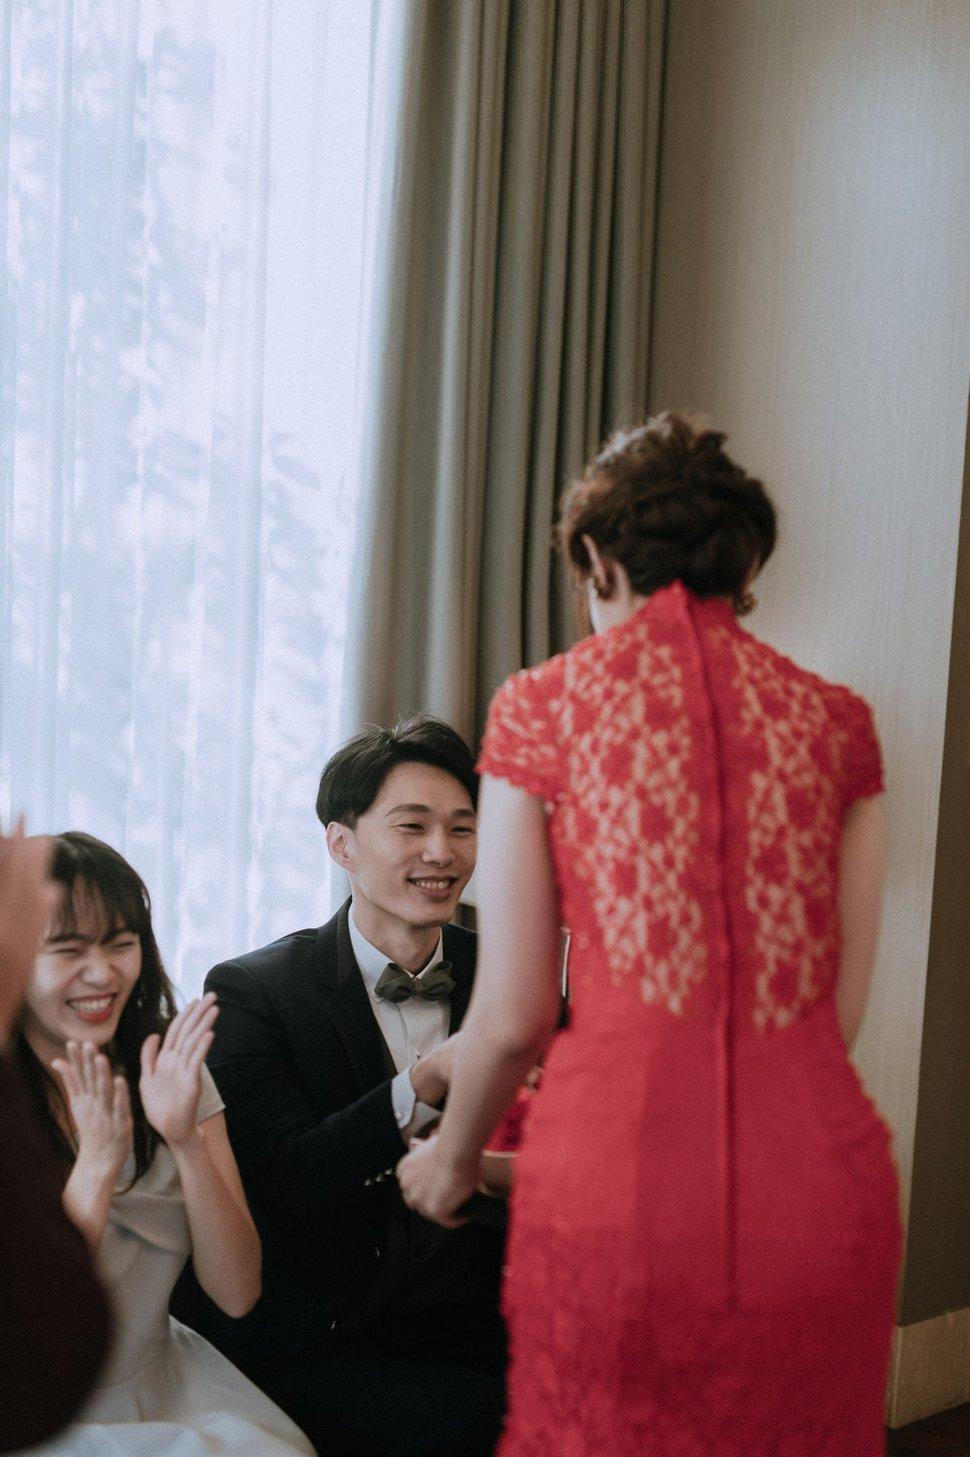 85200743_1062585227432633_1835301940045545472_o_1062585220765967 - 許仙 XuXian攝影工作室《結婚吧》